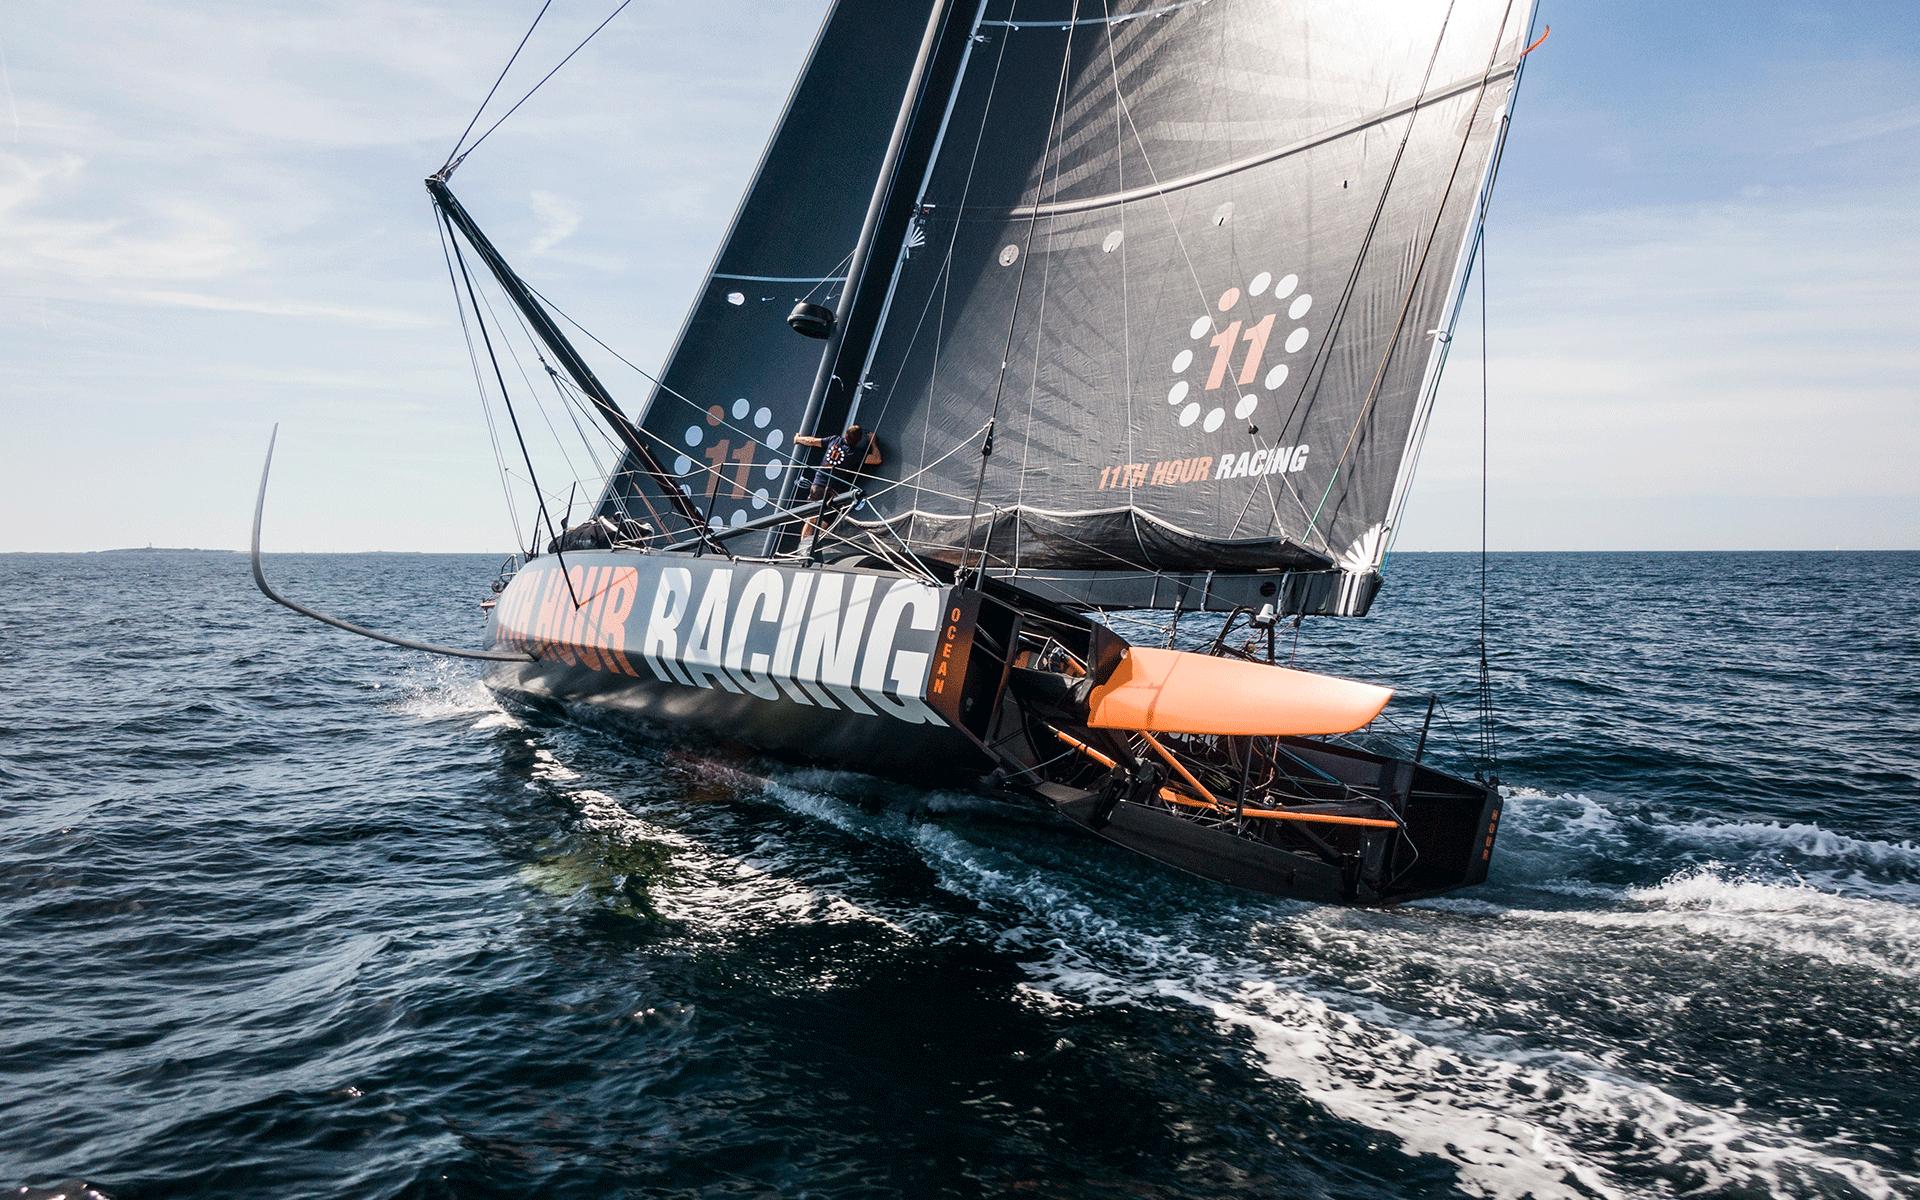 11th Hour Racing Team, Amory Ross, Imoca 60, Sailing Team, France, Foiling